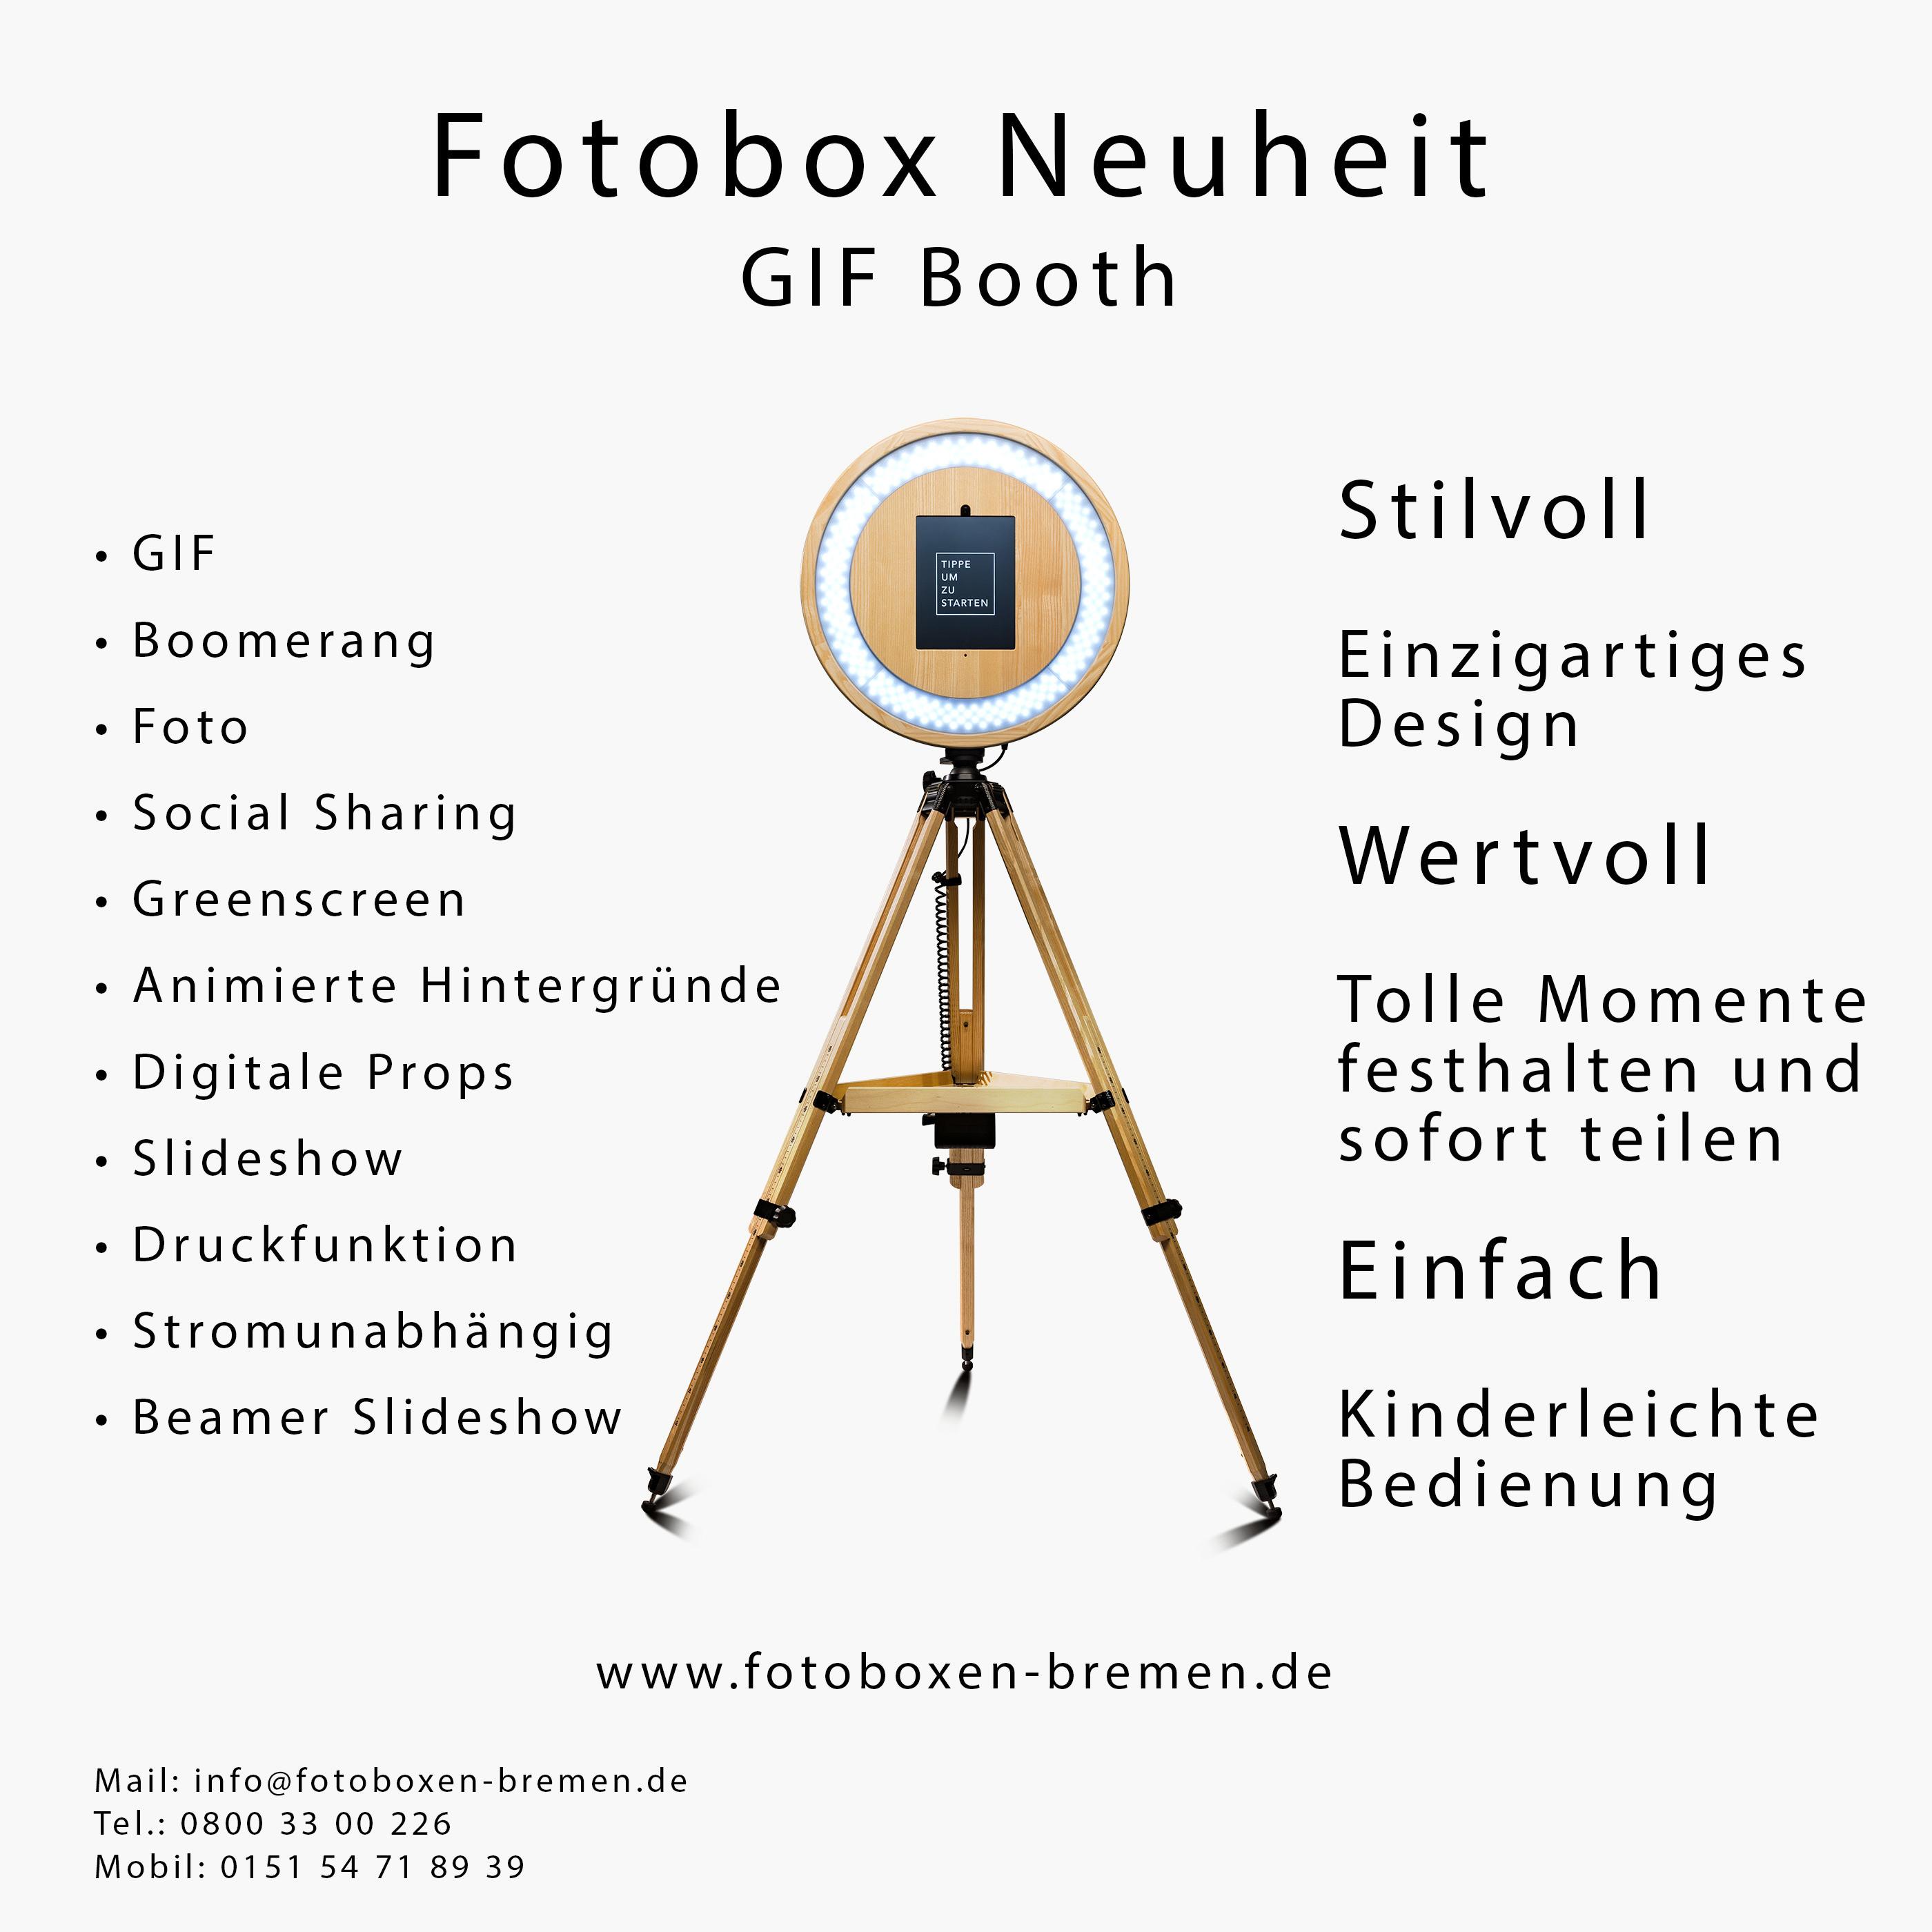 GIF Booth Fotobox